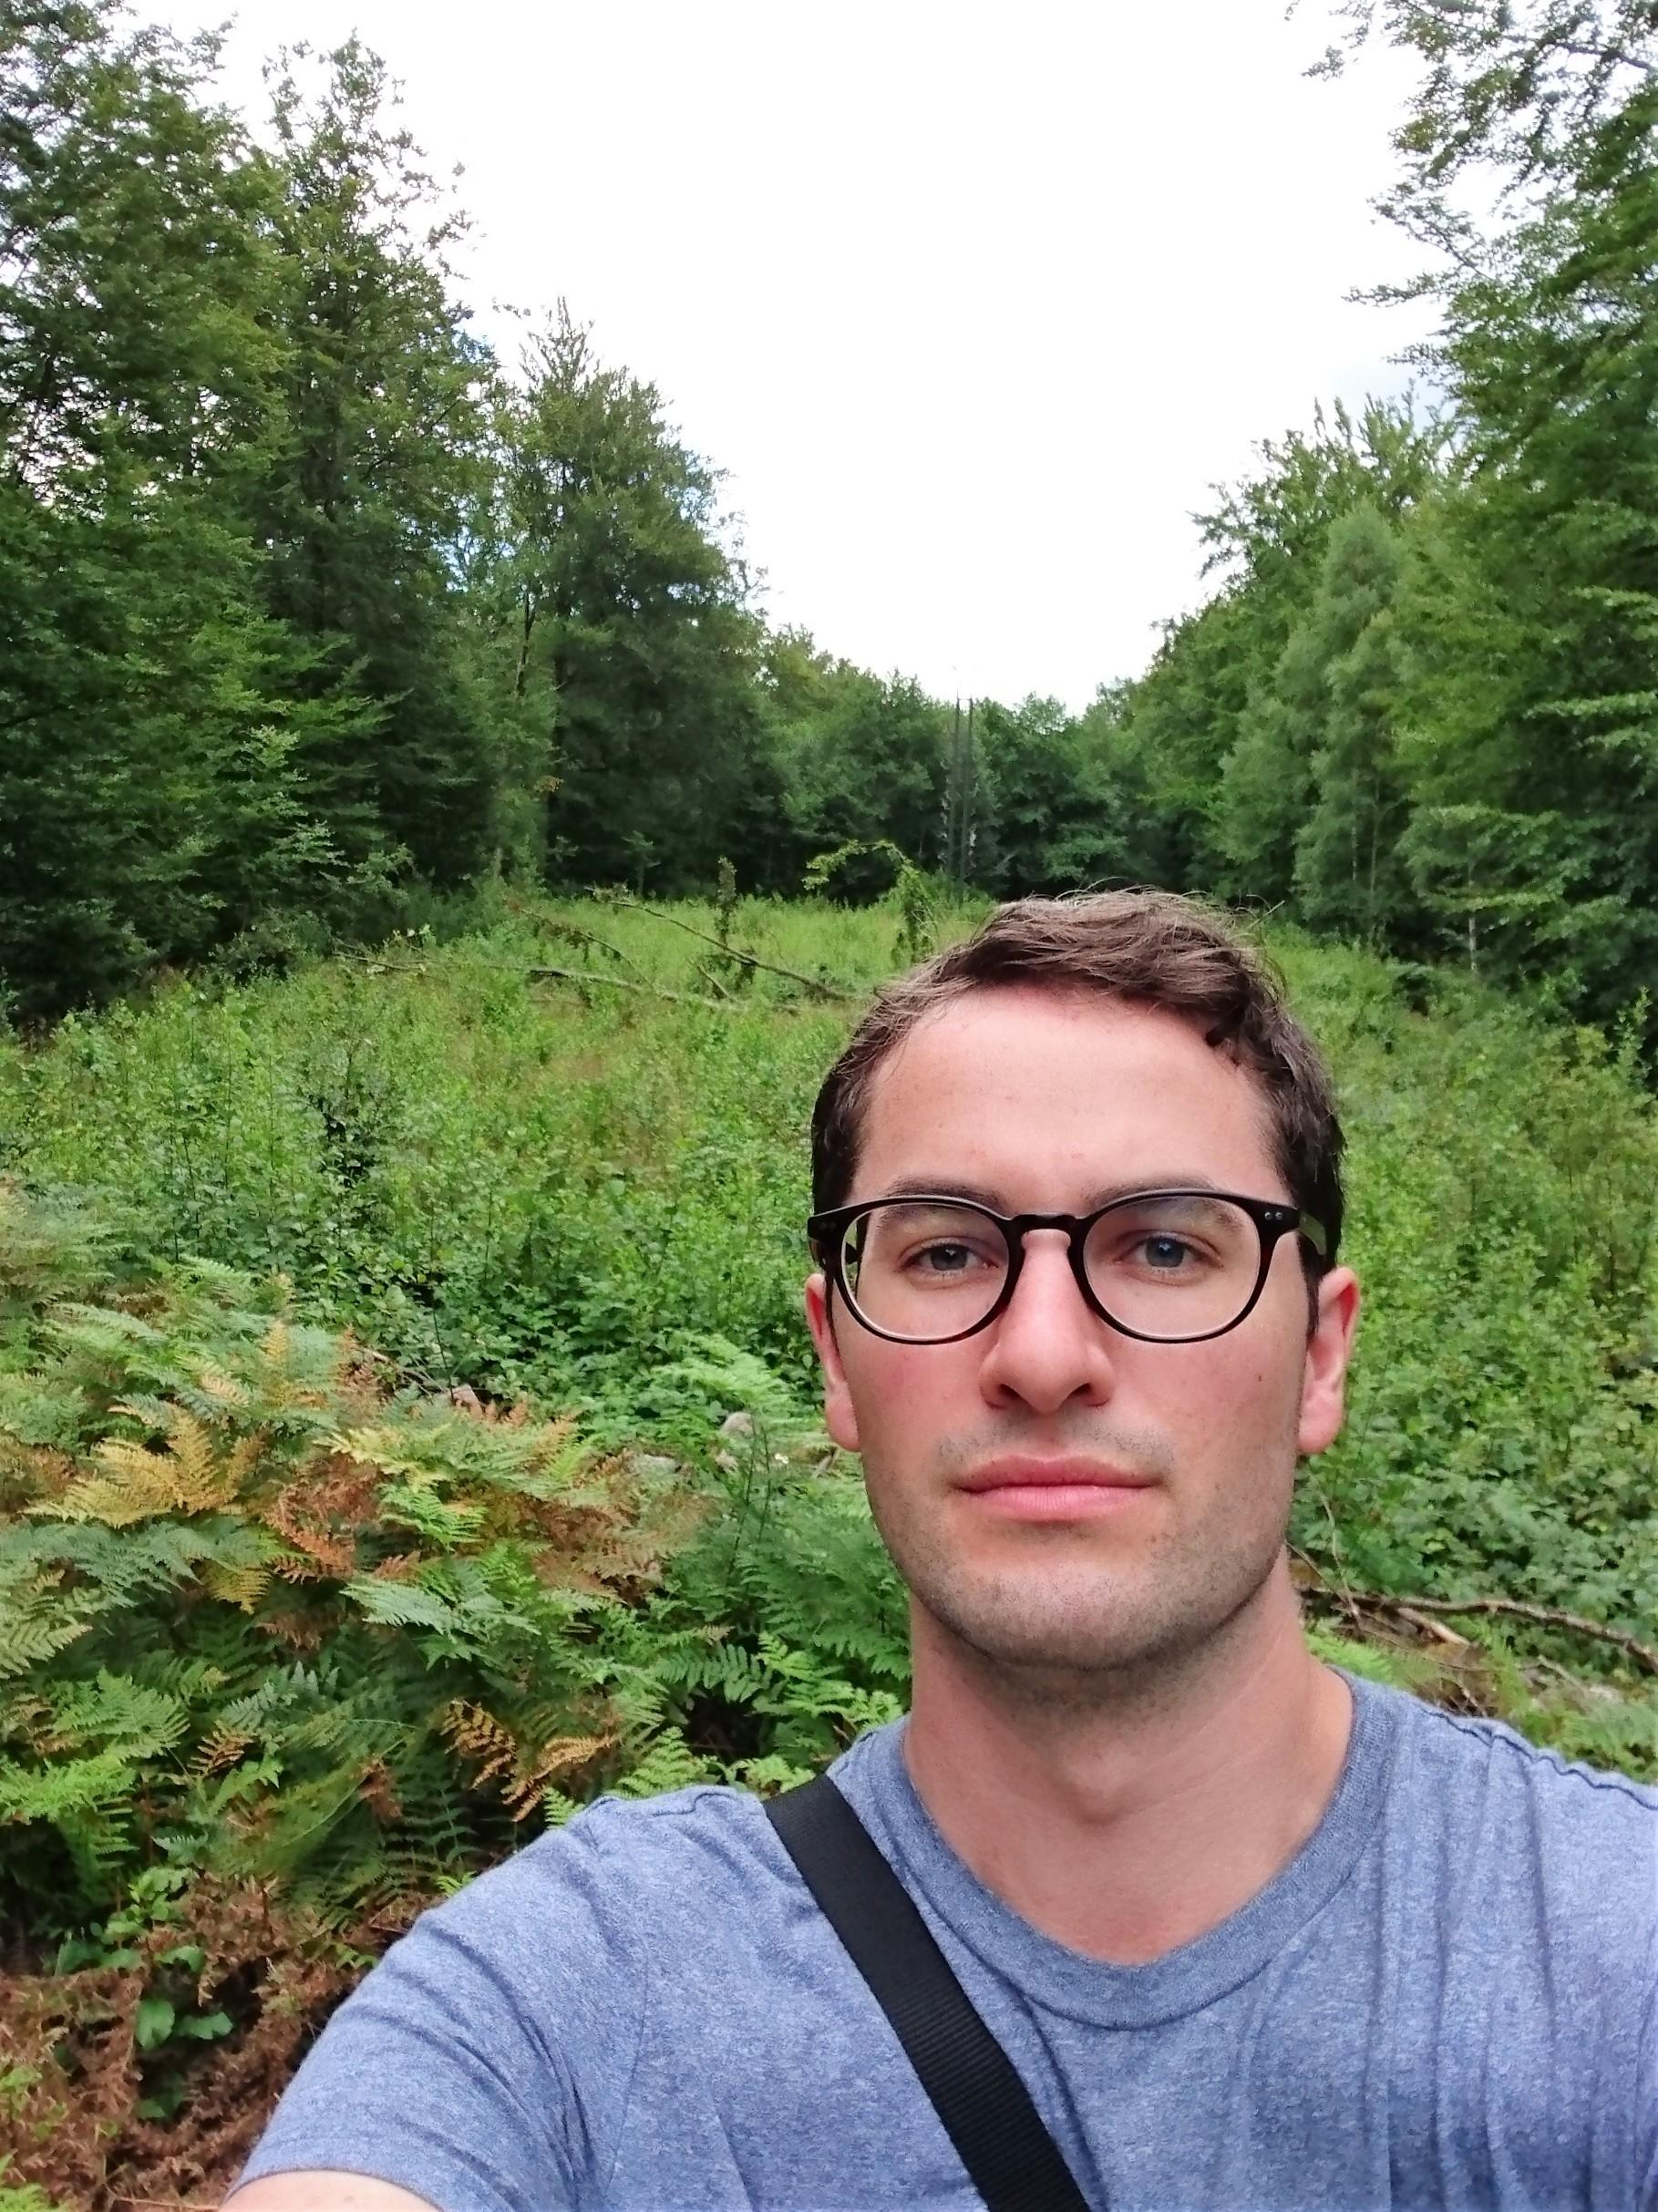 Johan tar selfie bland träden